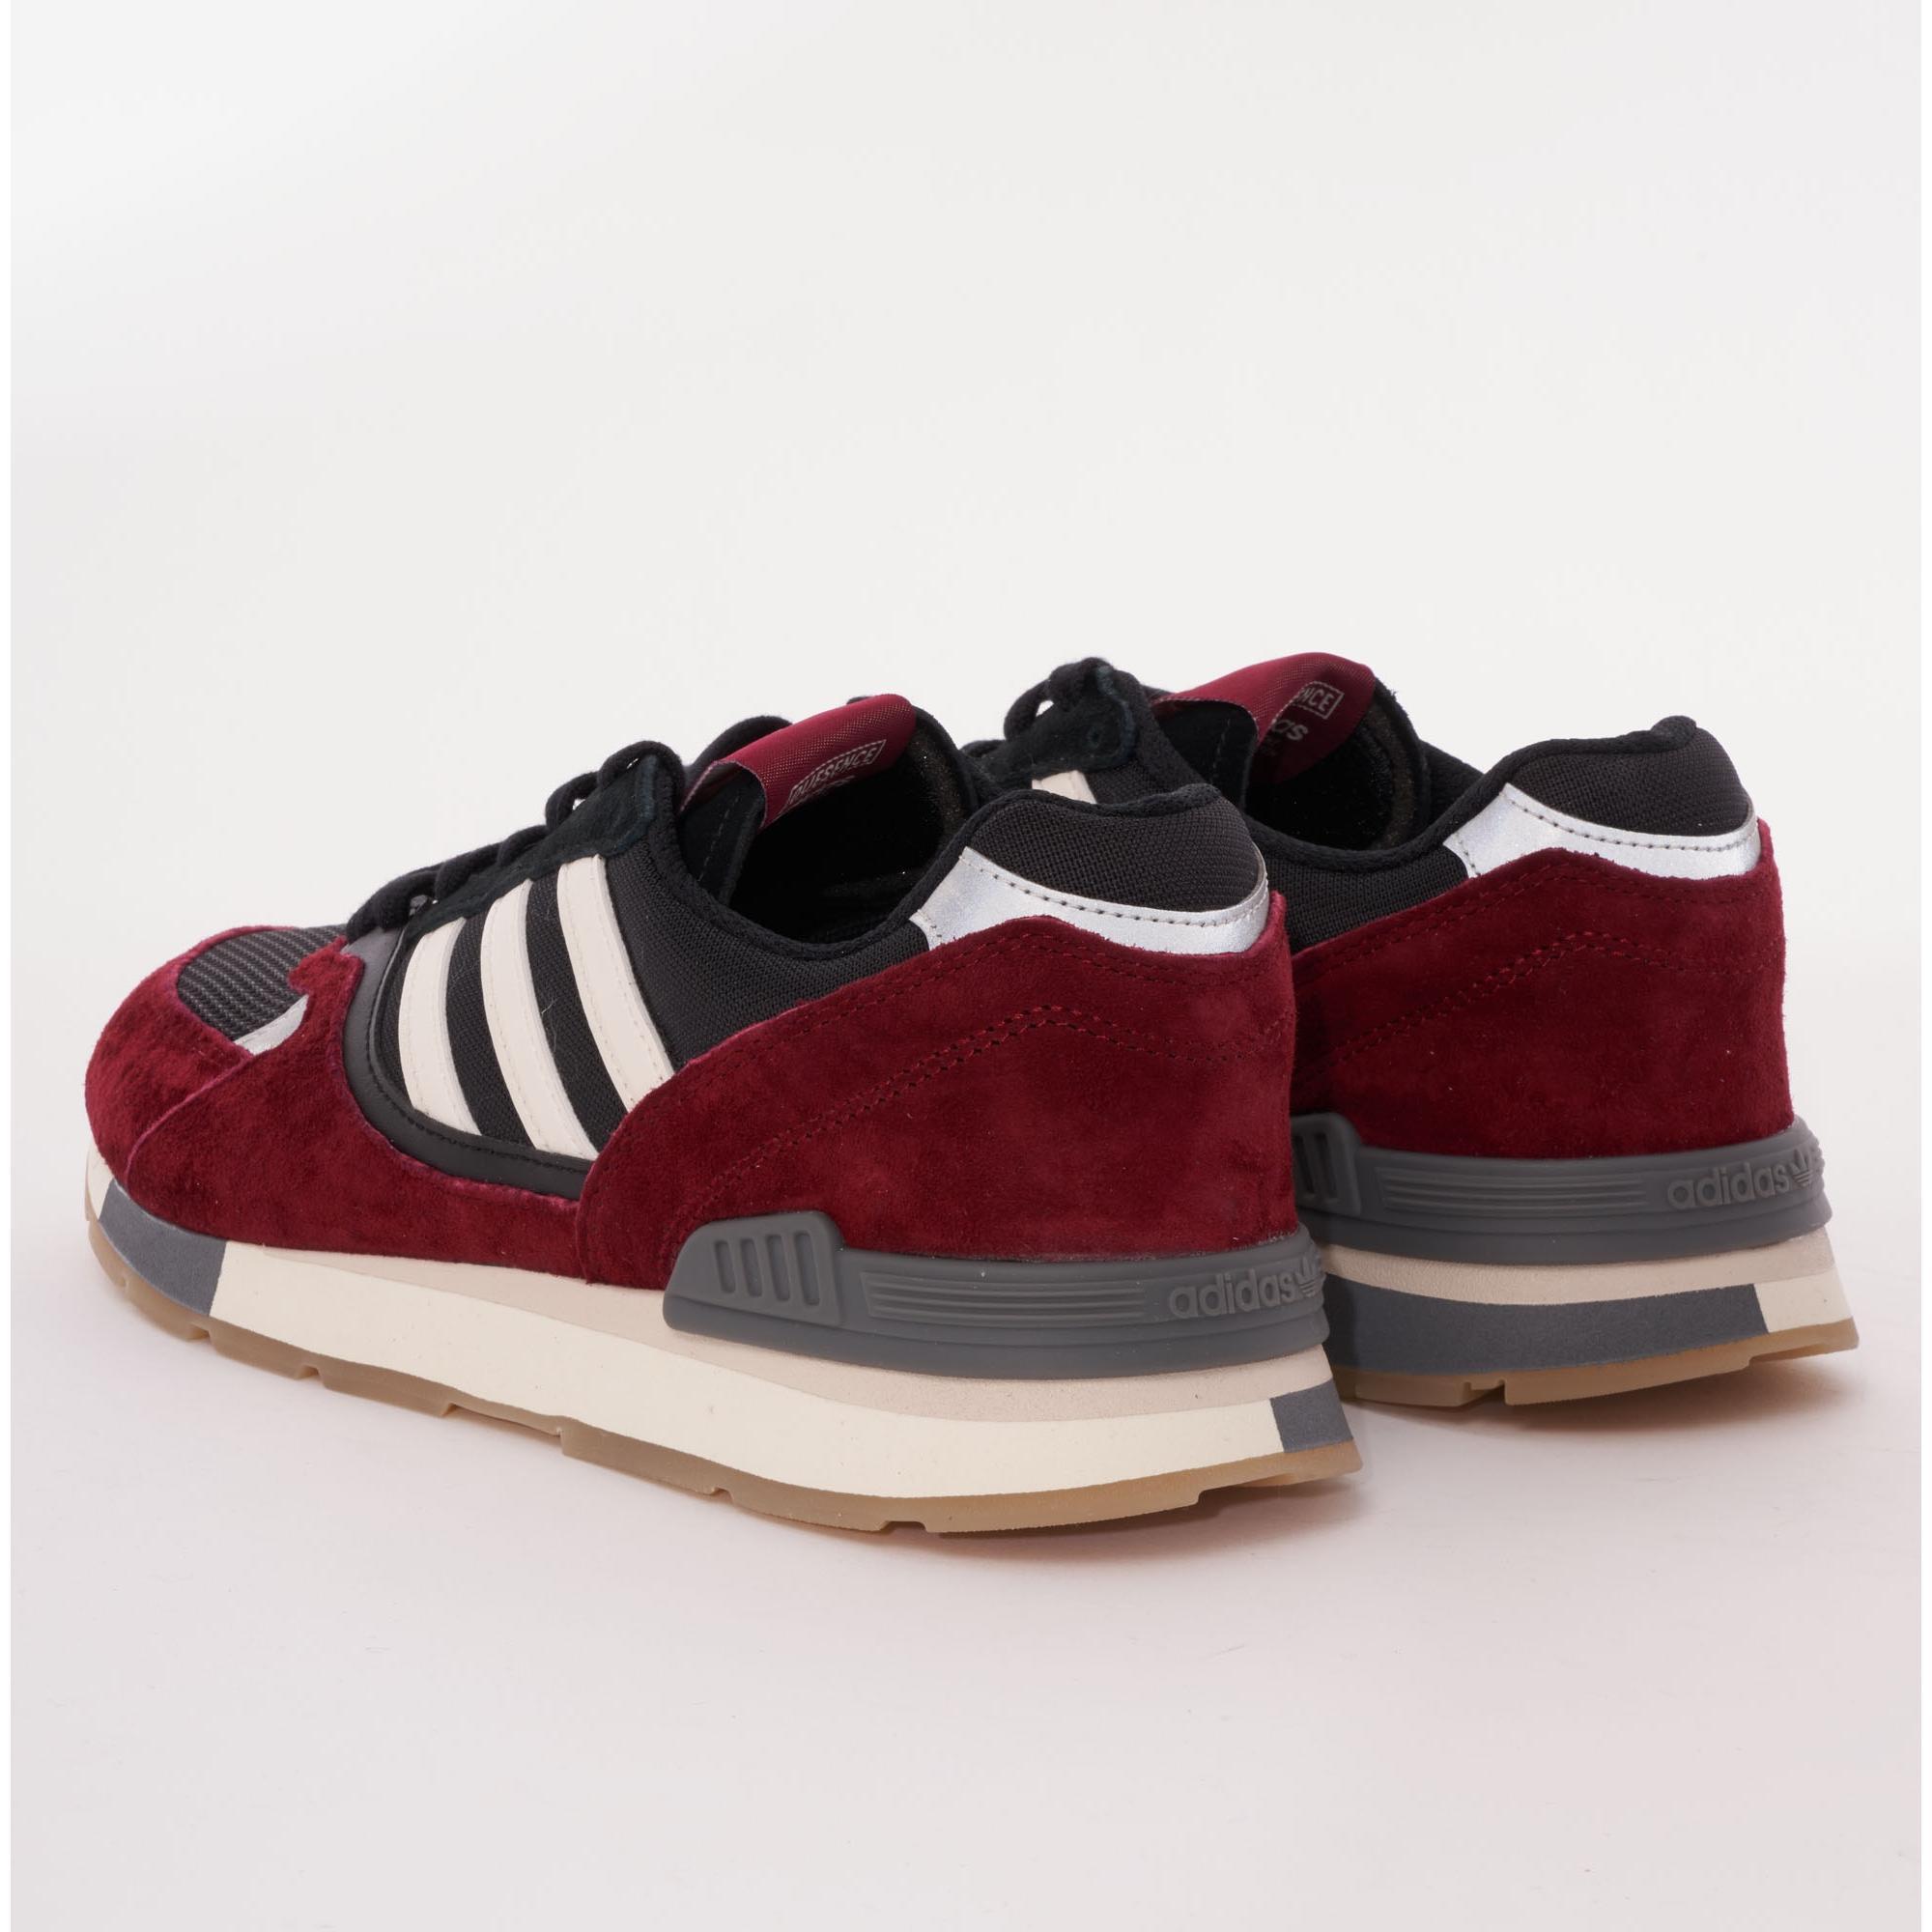 quality design 4357f b692d Adidas Originals - Red Quesence - Collegiate Burgundy, Chalk White  Core  Black for Men. View fullscreen